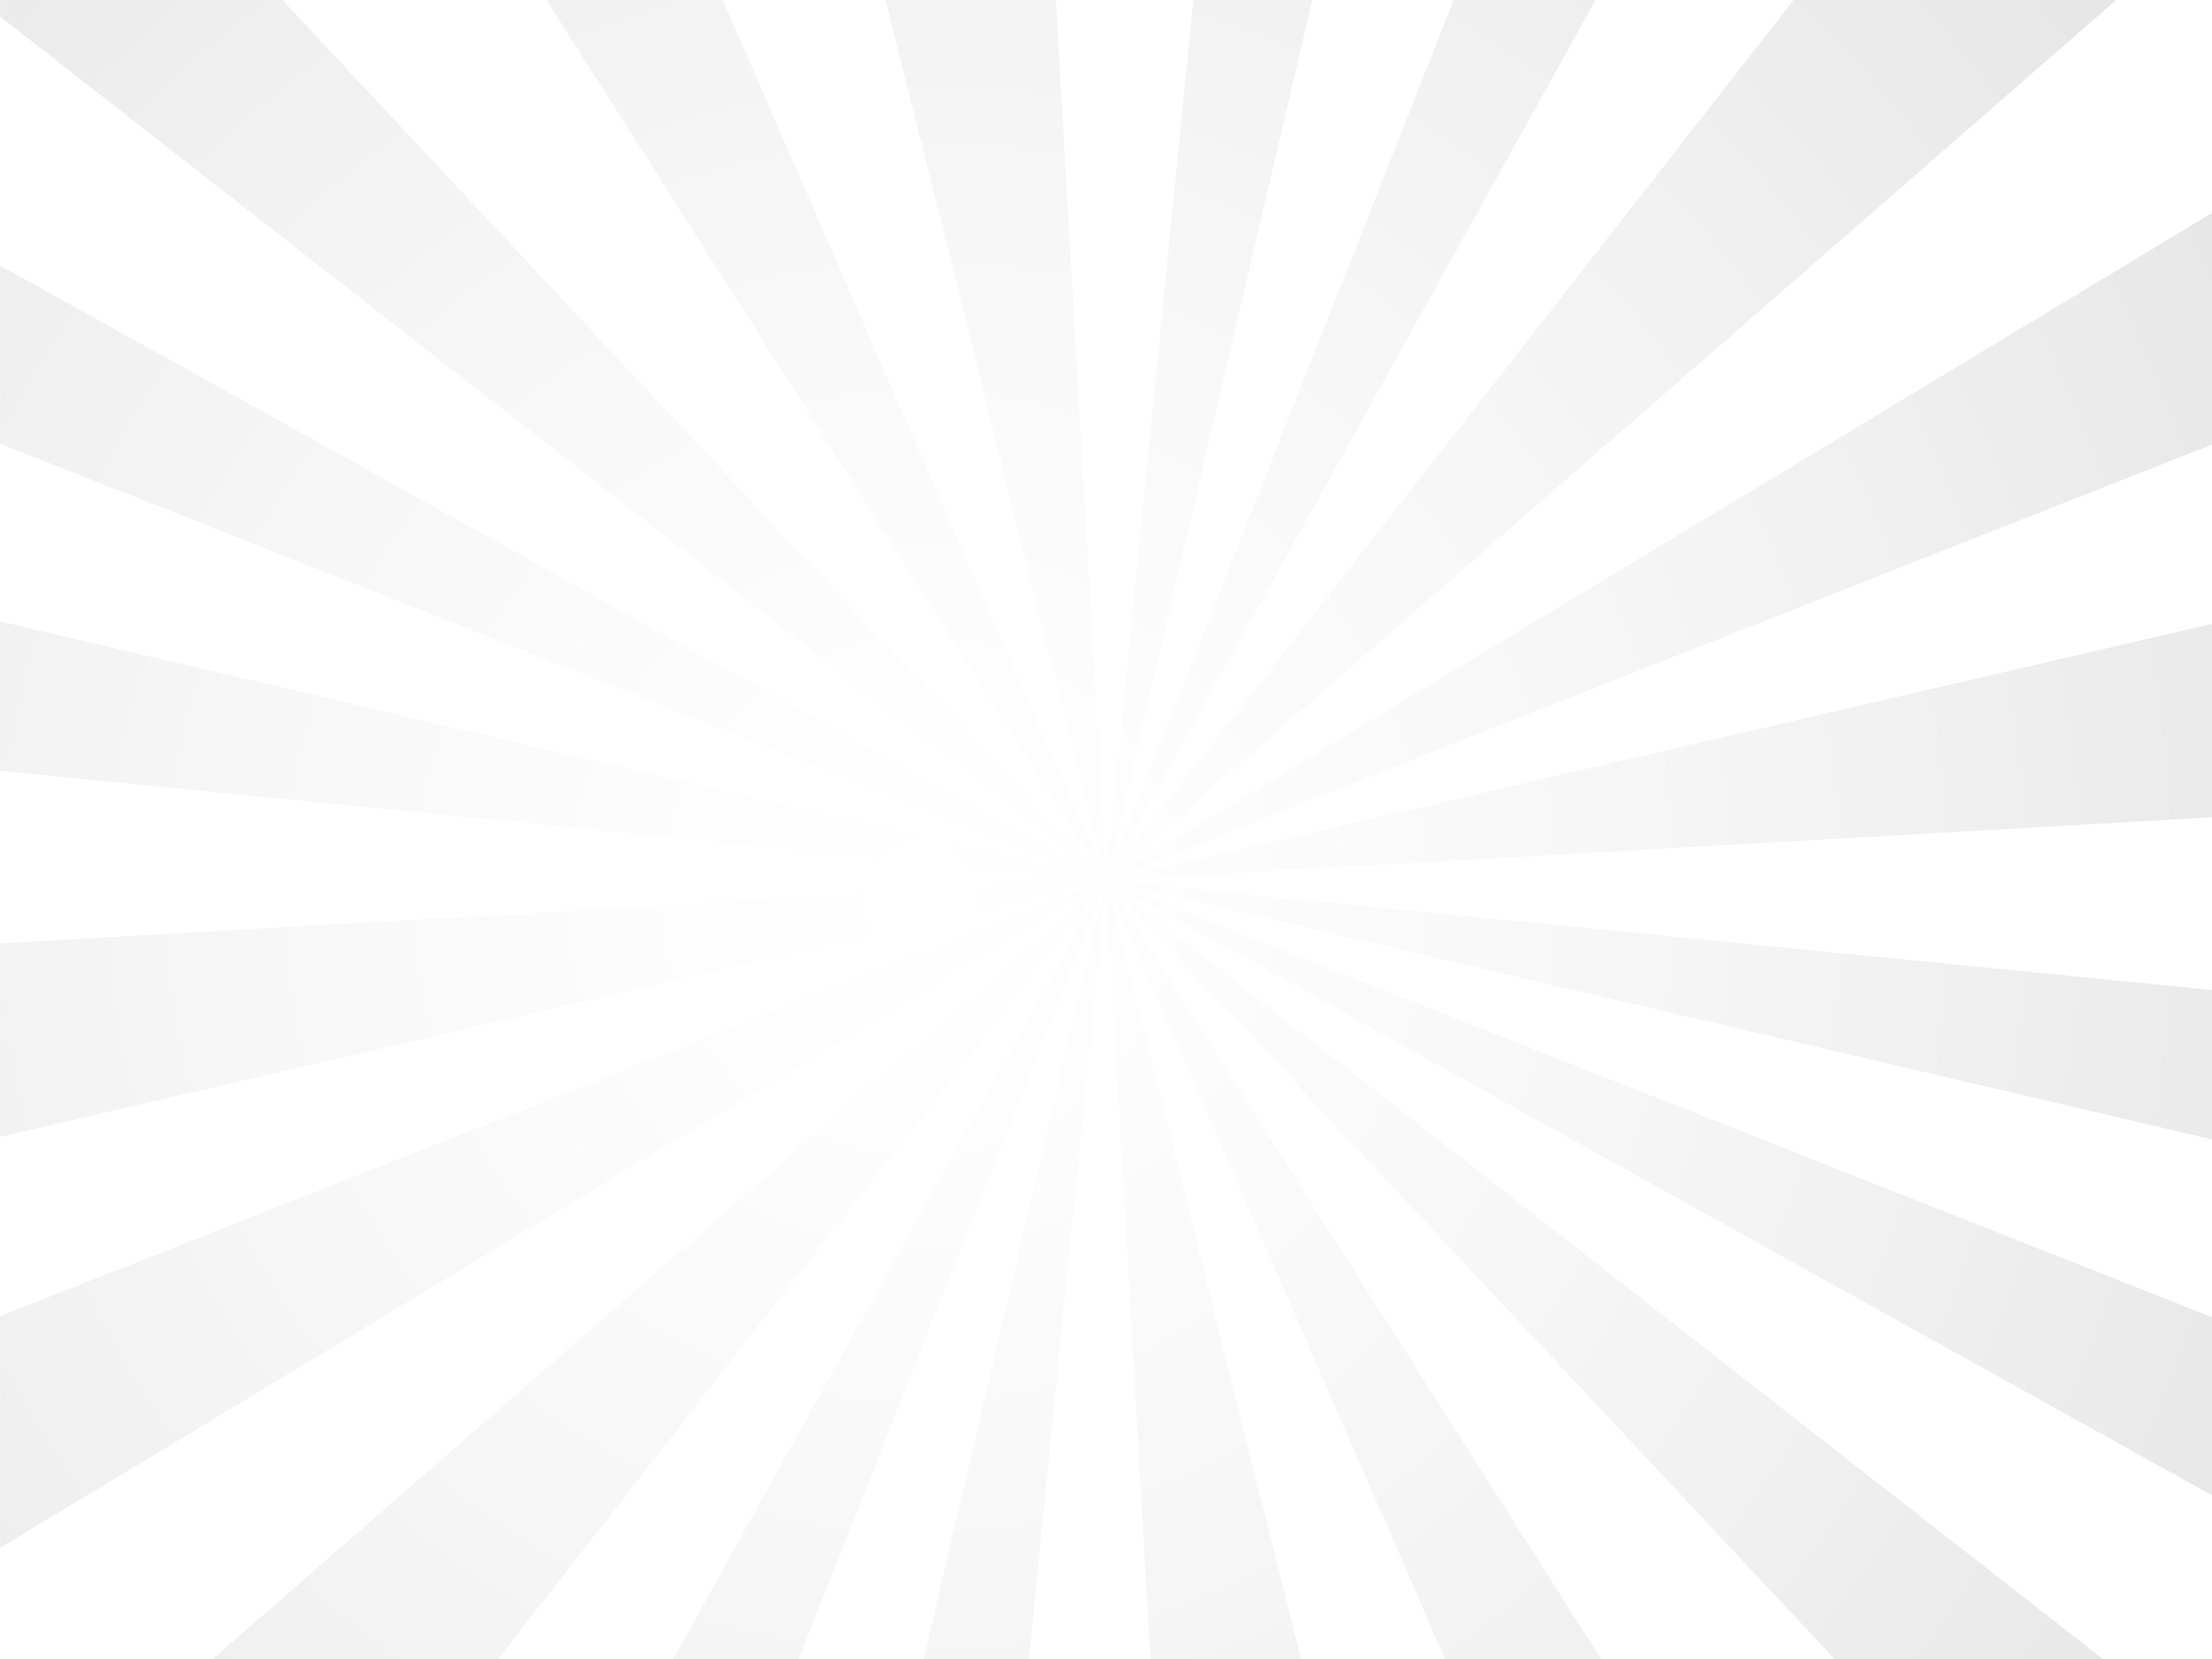 Background Effect Transparent Clip Art PNG Image.